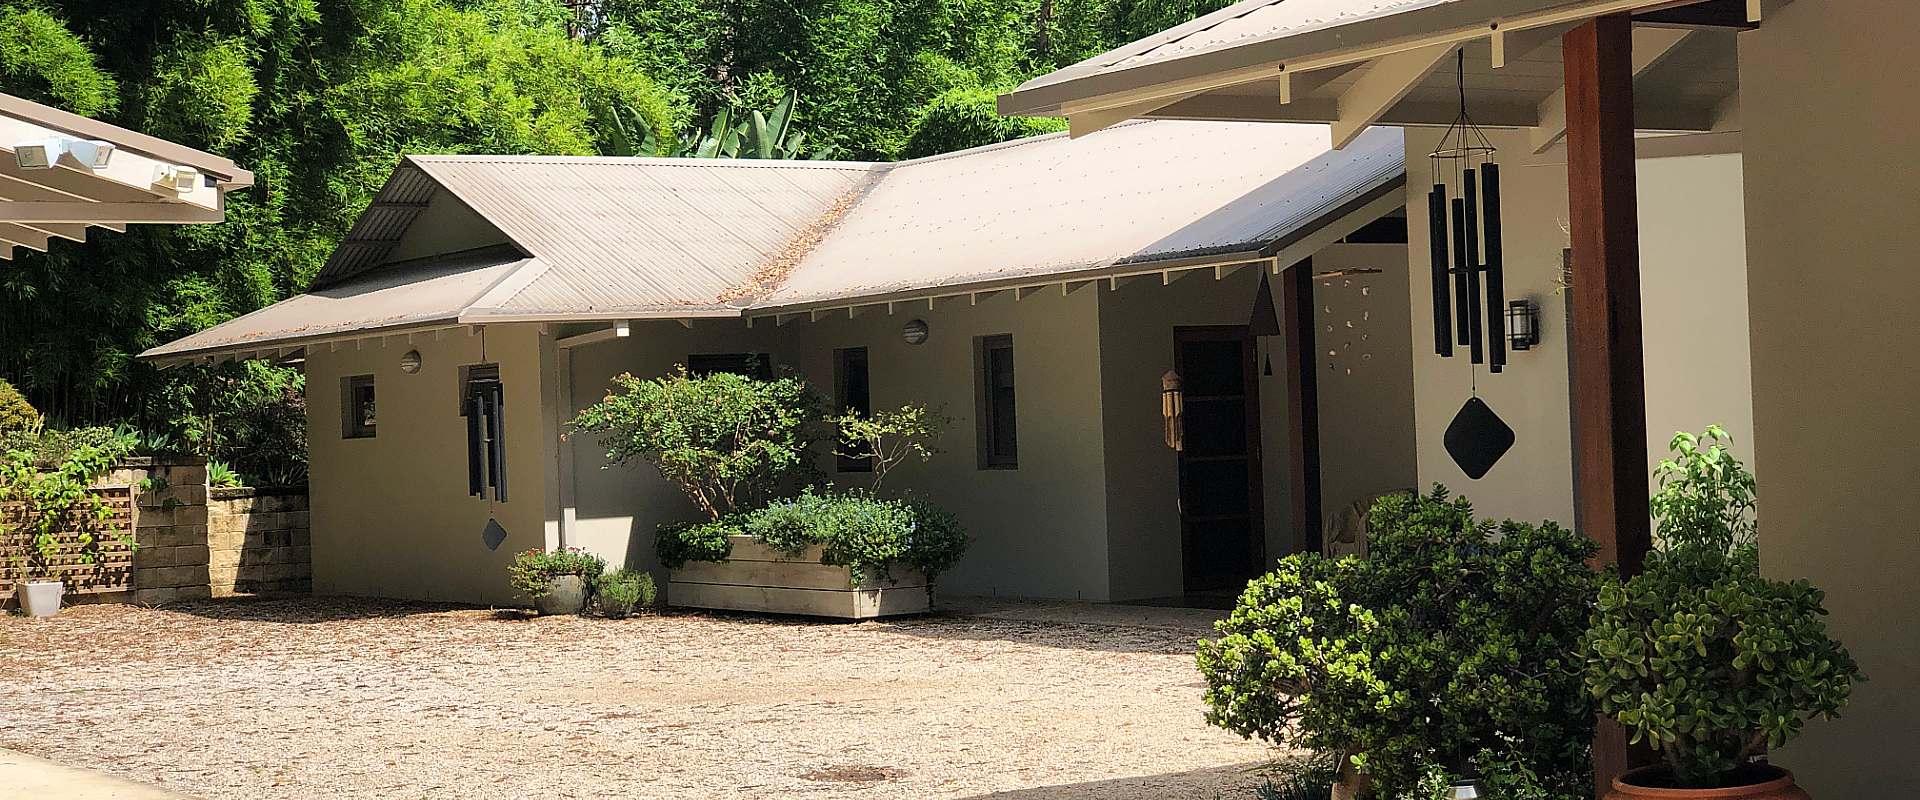 valla-accommodation-banner-99